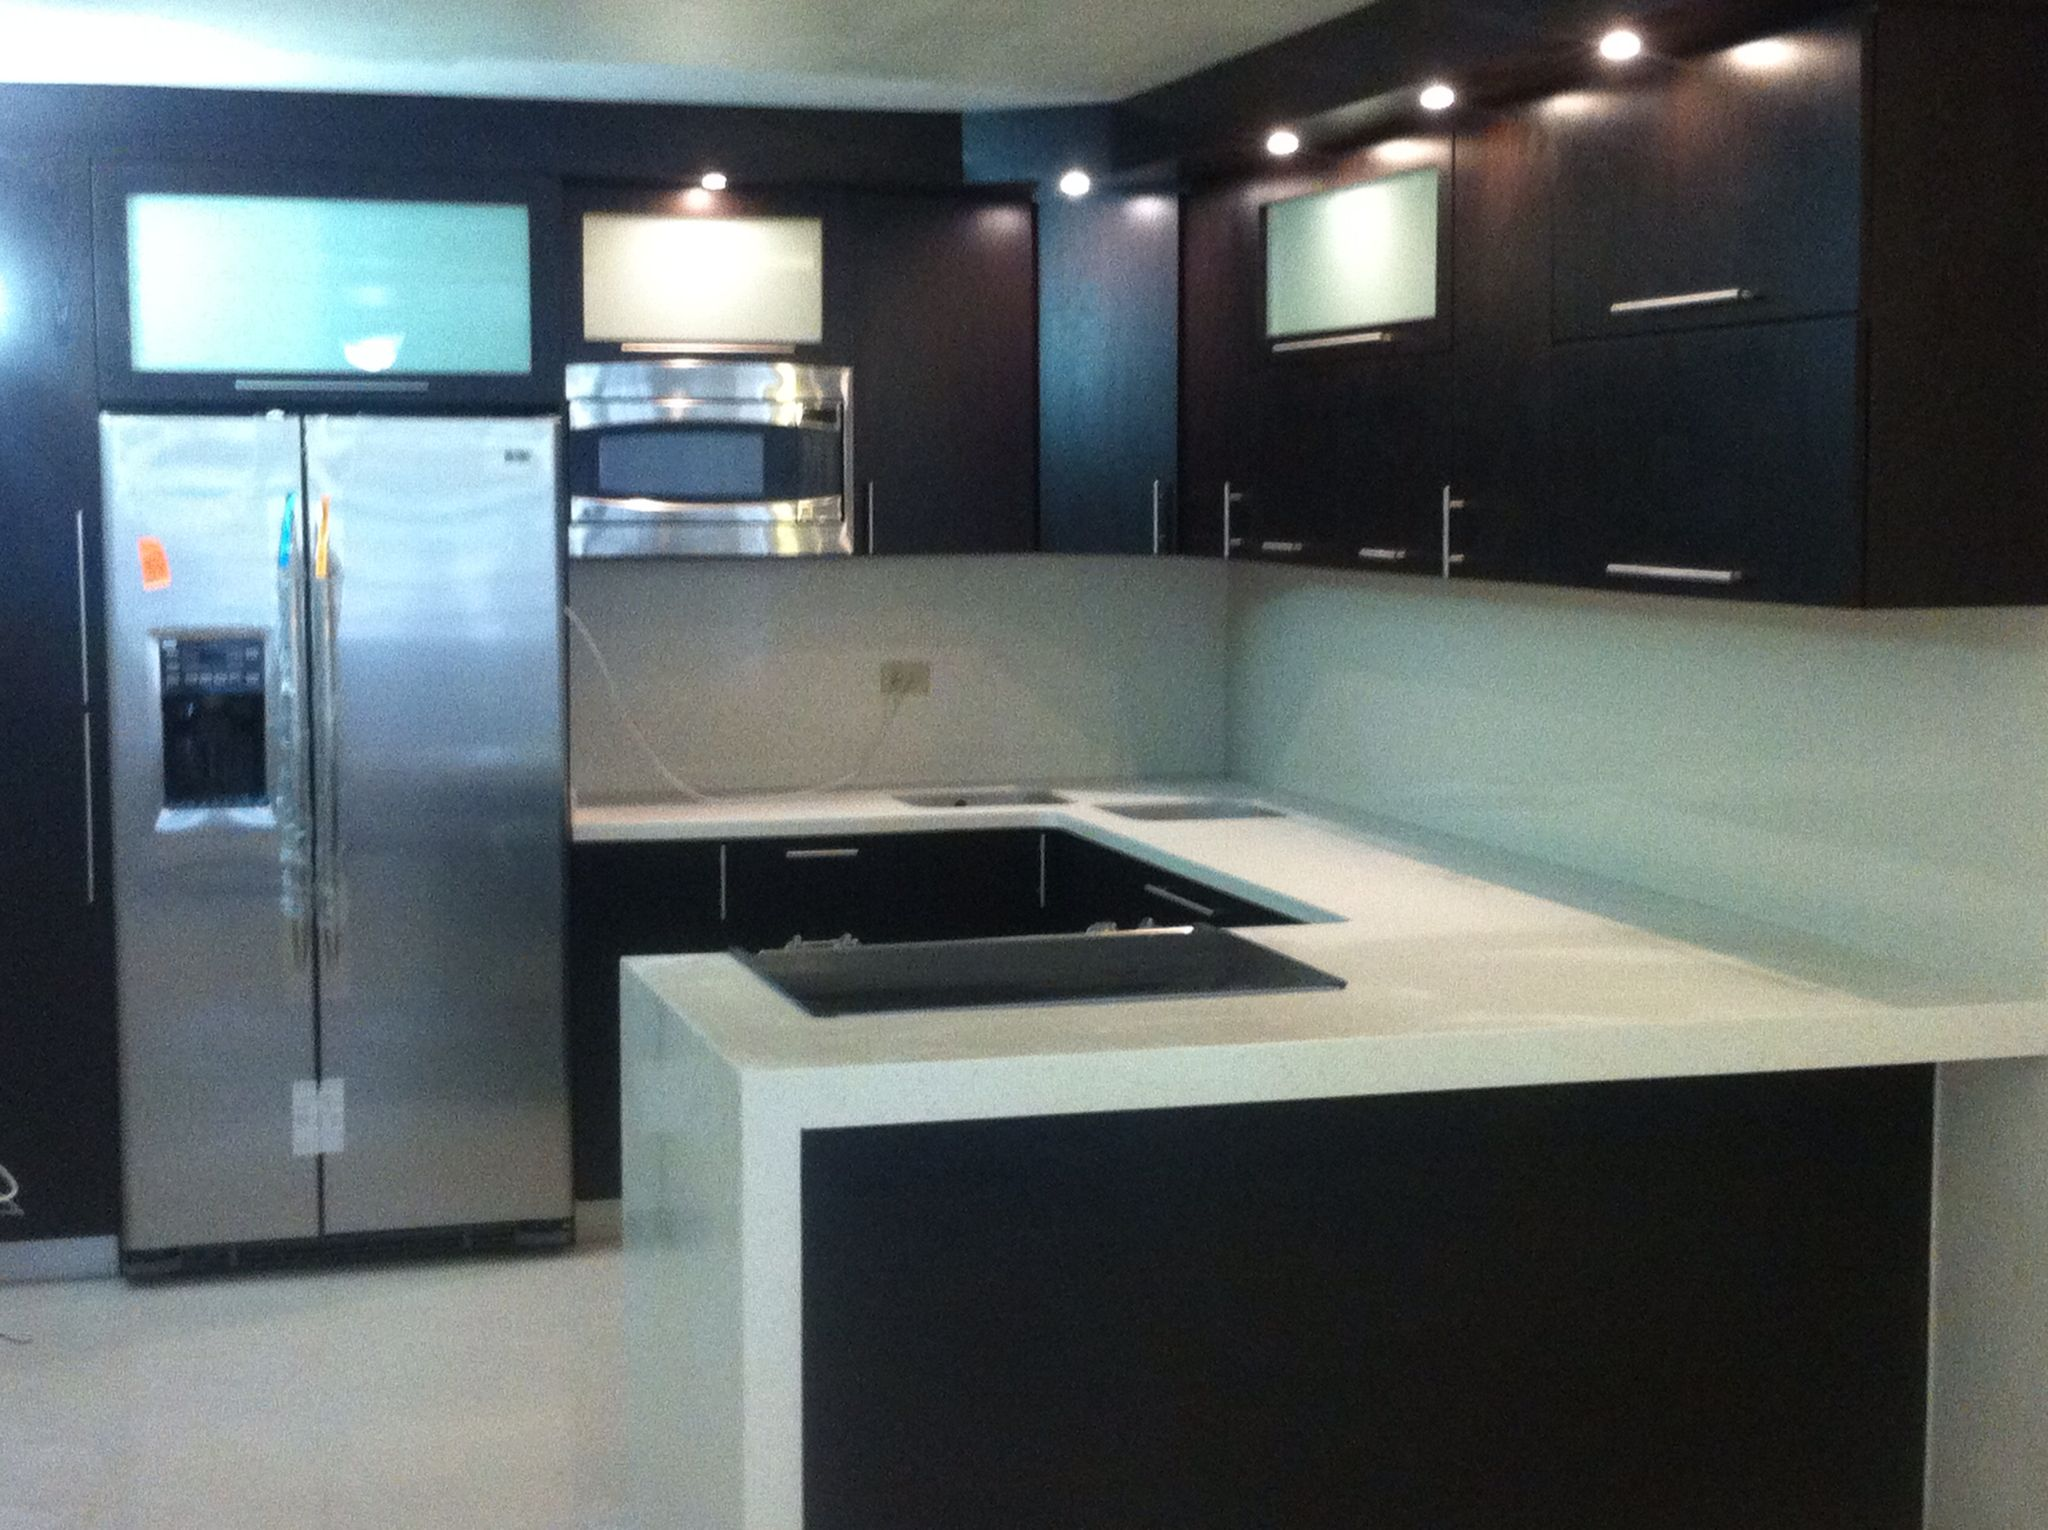 Gabinetes pvc superficie s lida corian gabinetes cocina for Superficie cocina